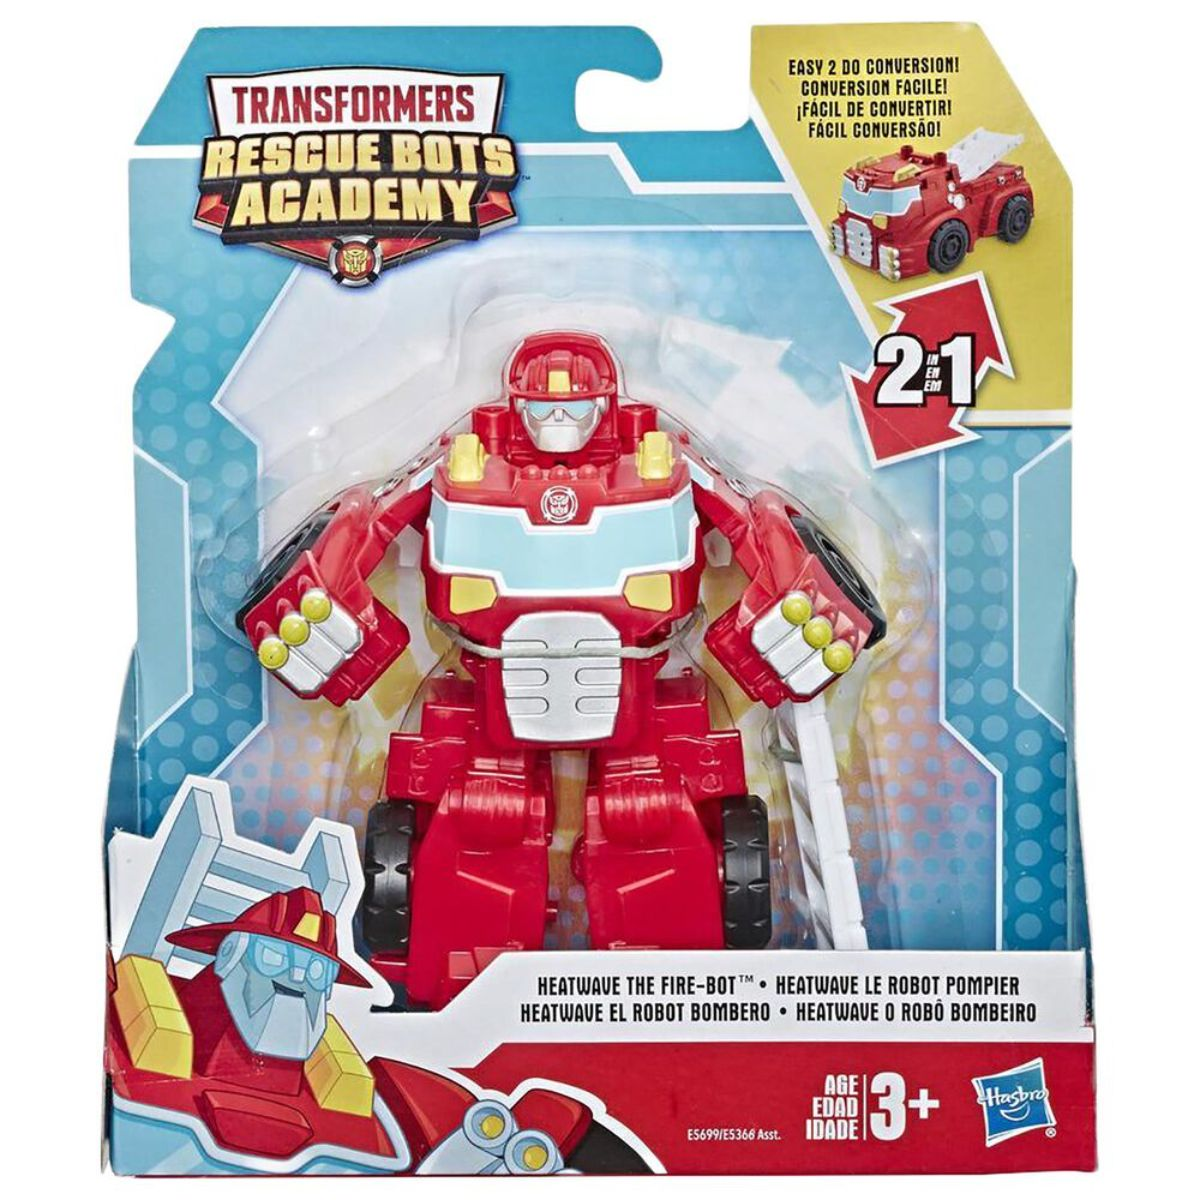 Figurina Transformers, Rescue Bots Academy, Heatwave the Fire-Bot, F08885